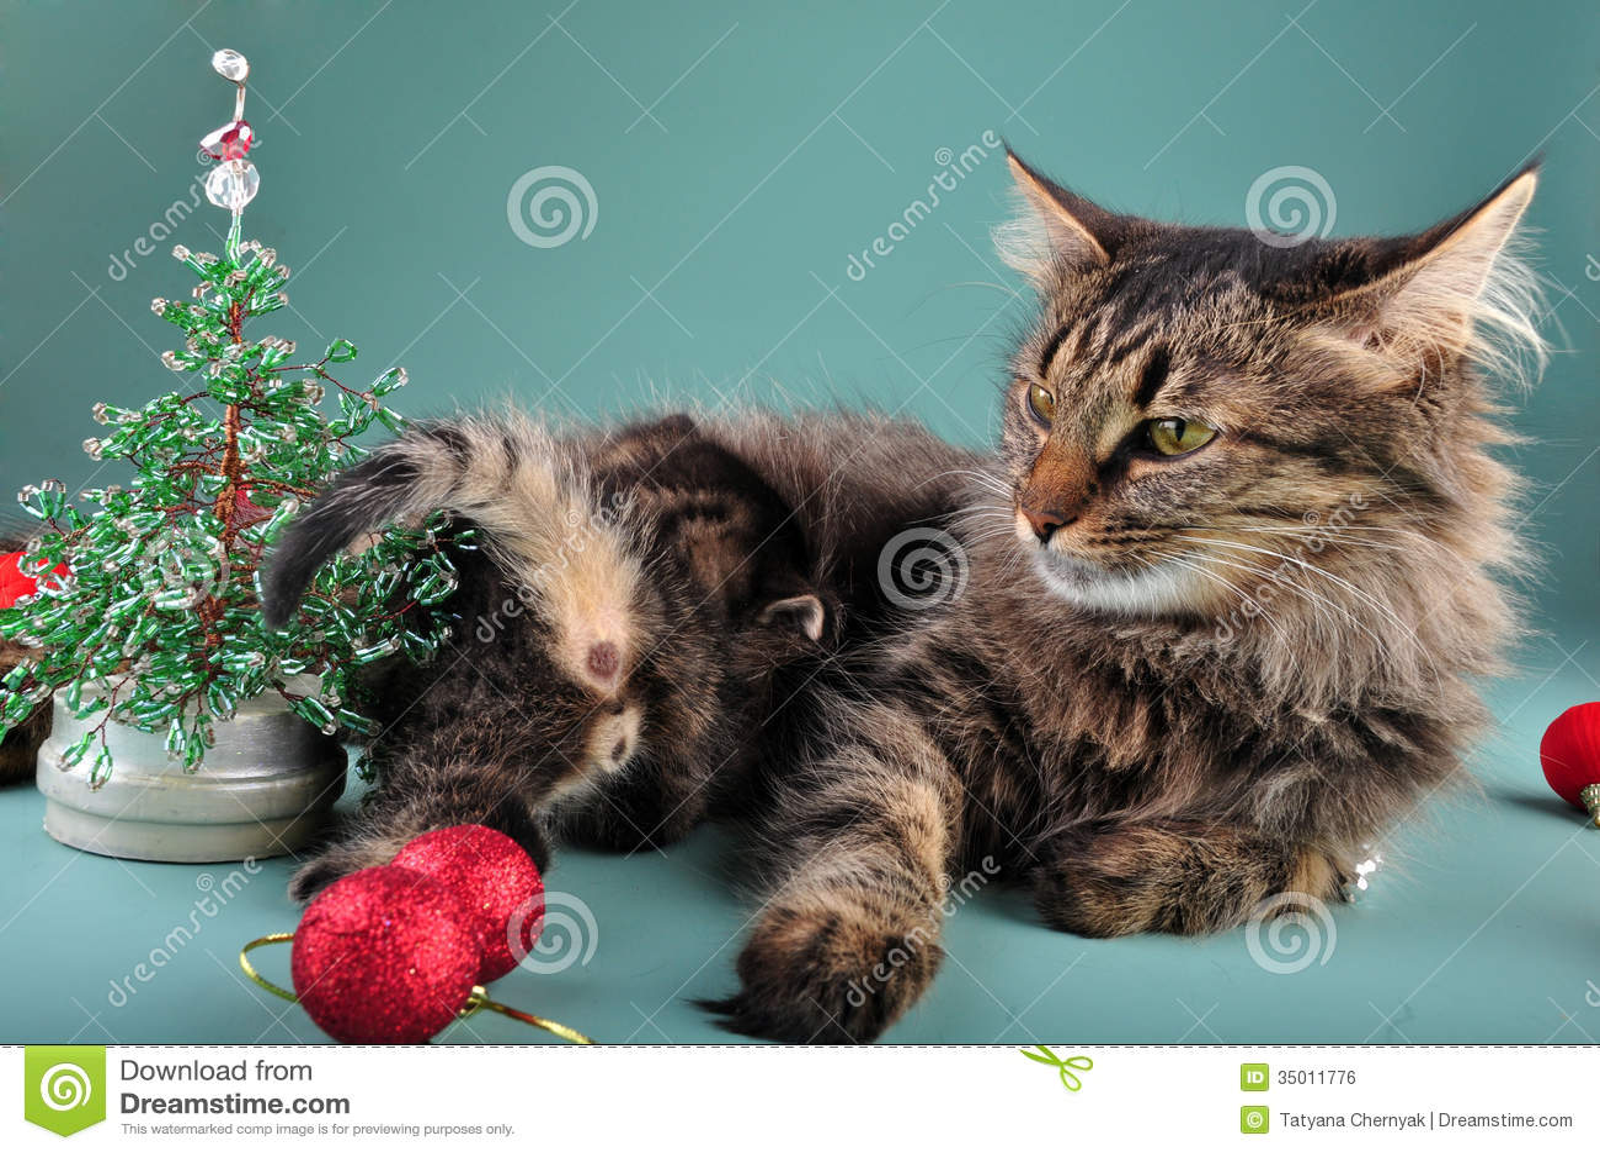 Pictures Of Christmas Stuff small kittens among christmas stuff stock photo - image: 35011220